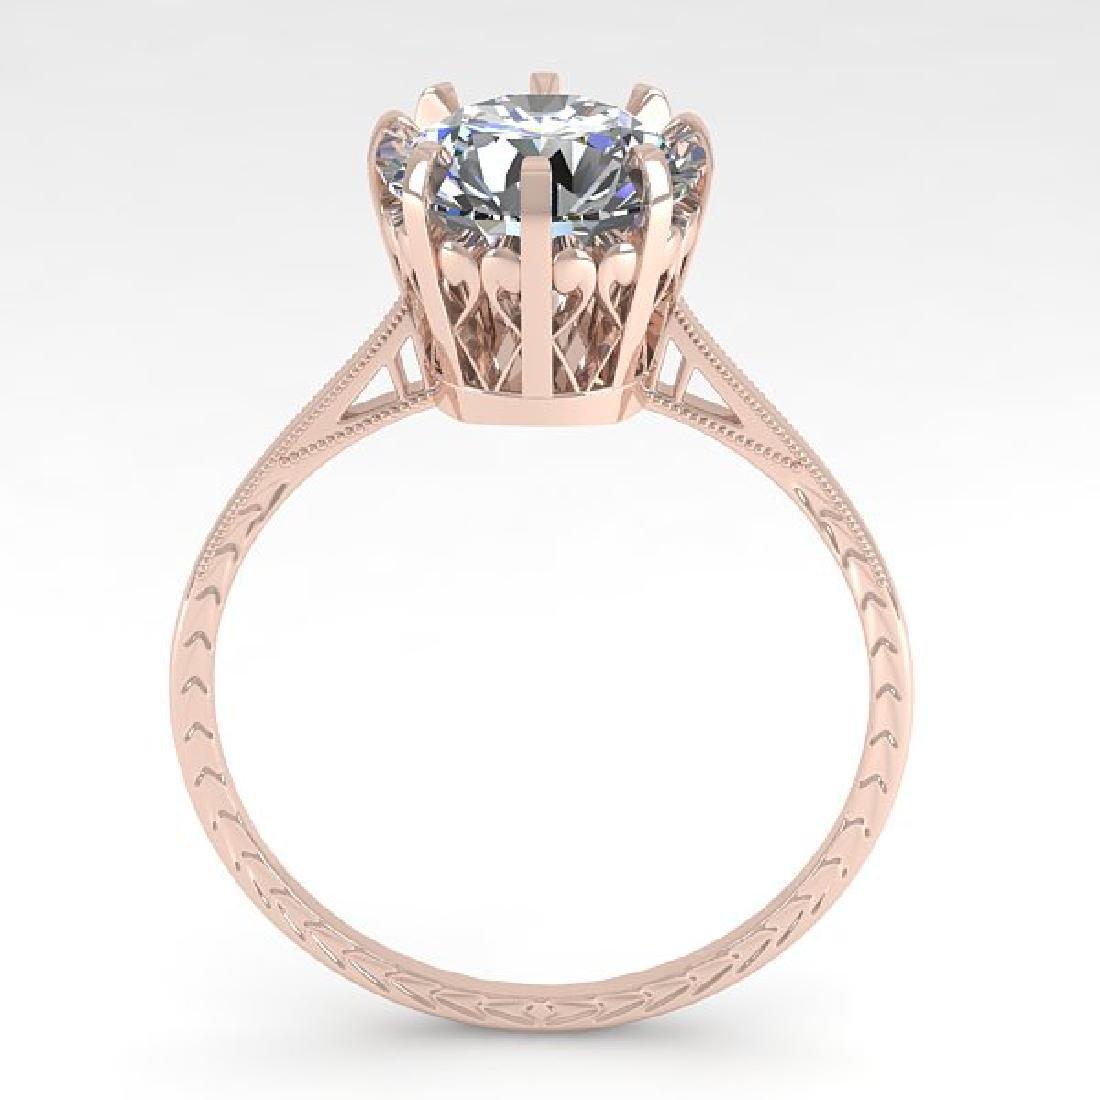 2 CTW VS/SI Diamond Solitaire Engagement Ring 18K Rose - 3